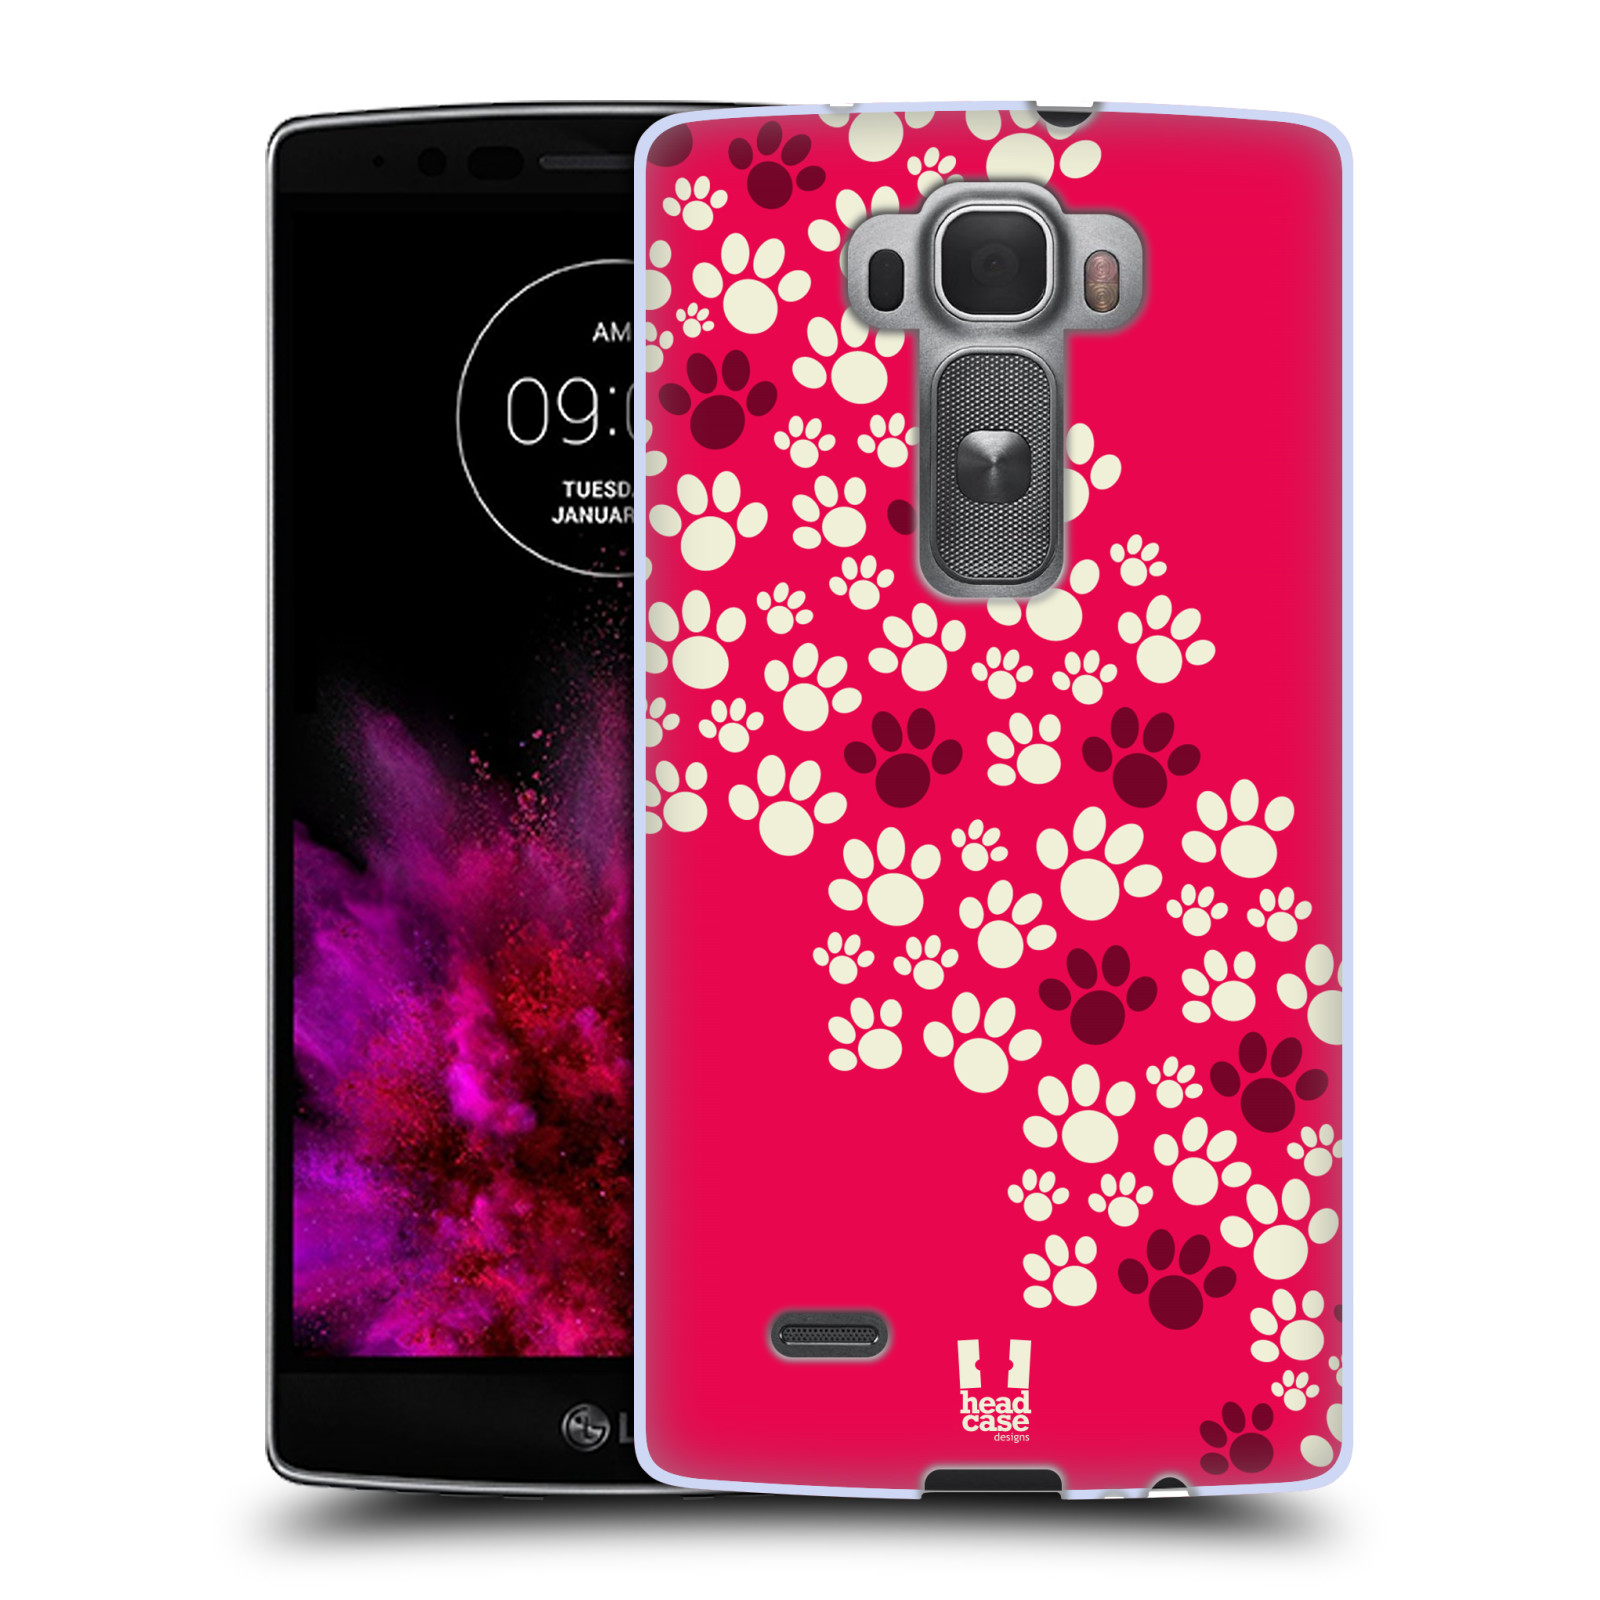 Silikonové pouzdro na mobil LG G Flex 2 HEAD CASE TLAPKY RŮŽOVÉ (Silikonový kryt či obal na mobilní telefon LG G Flex 2 H955)